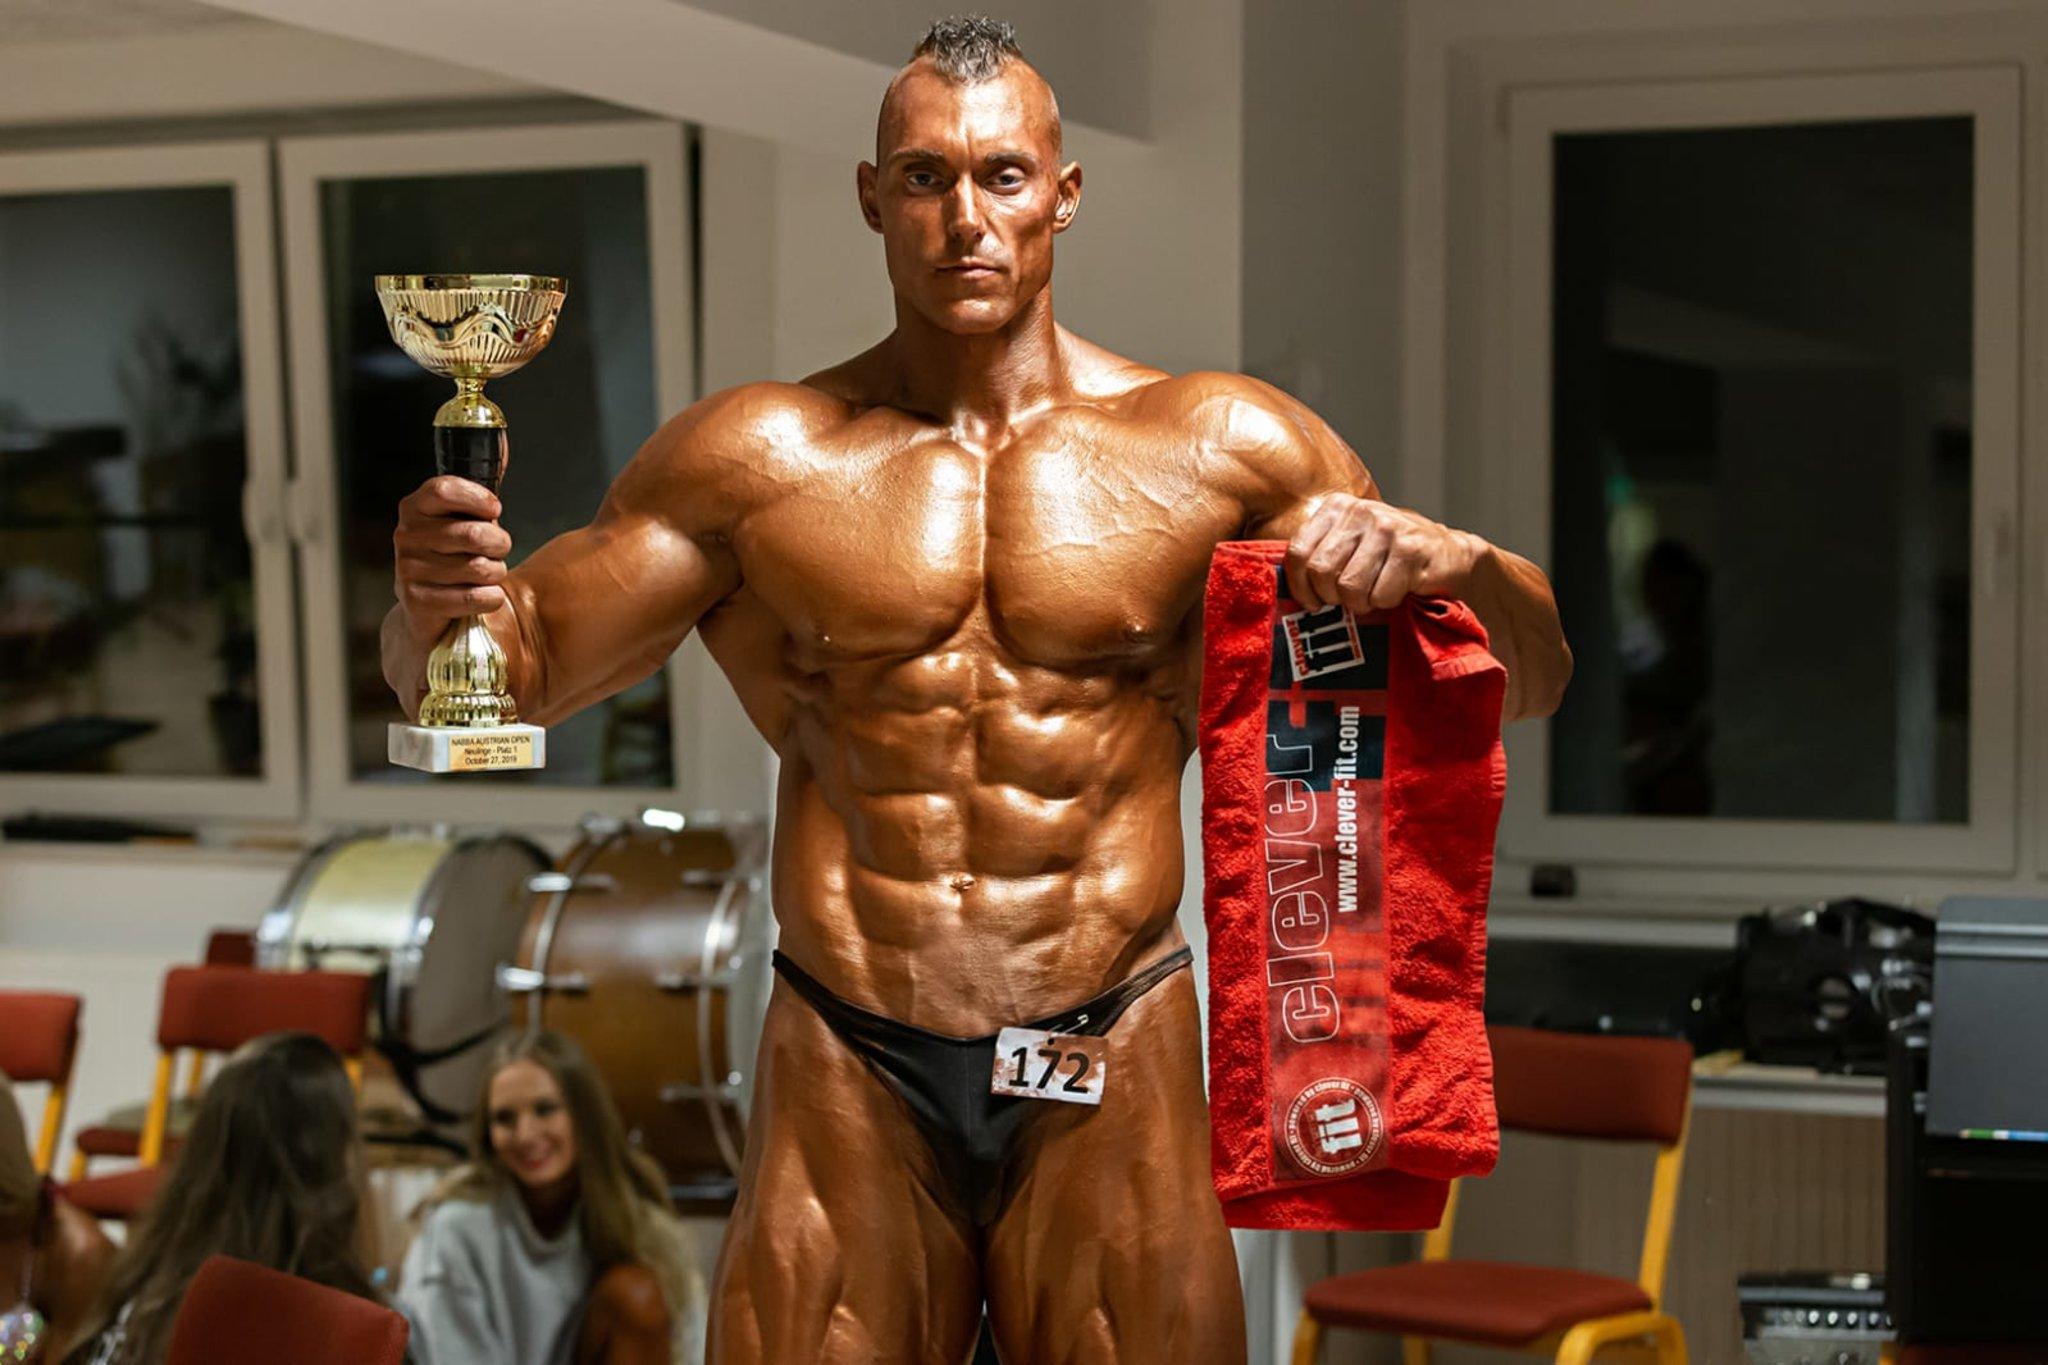 Bodybuilding: Hickl räumt Vize-Staatsmeistertitel ab - Tulln - meinbezirk.at